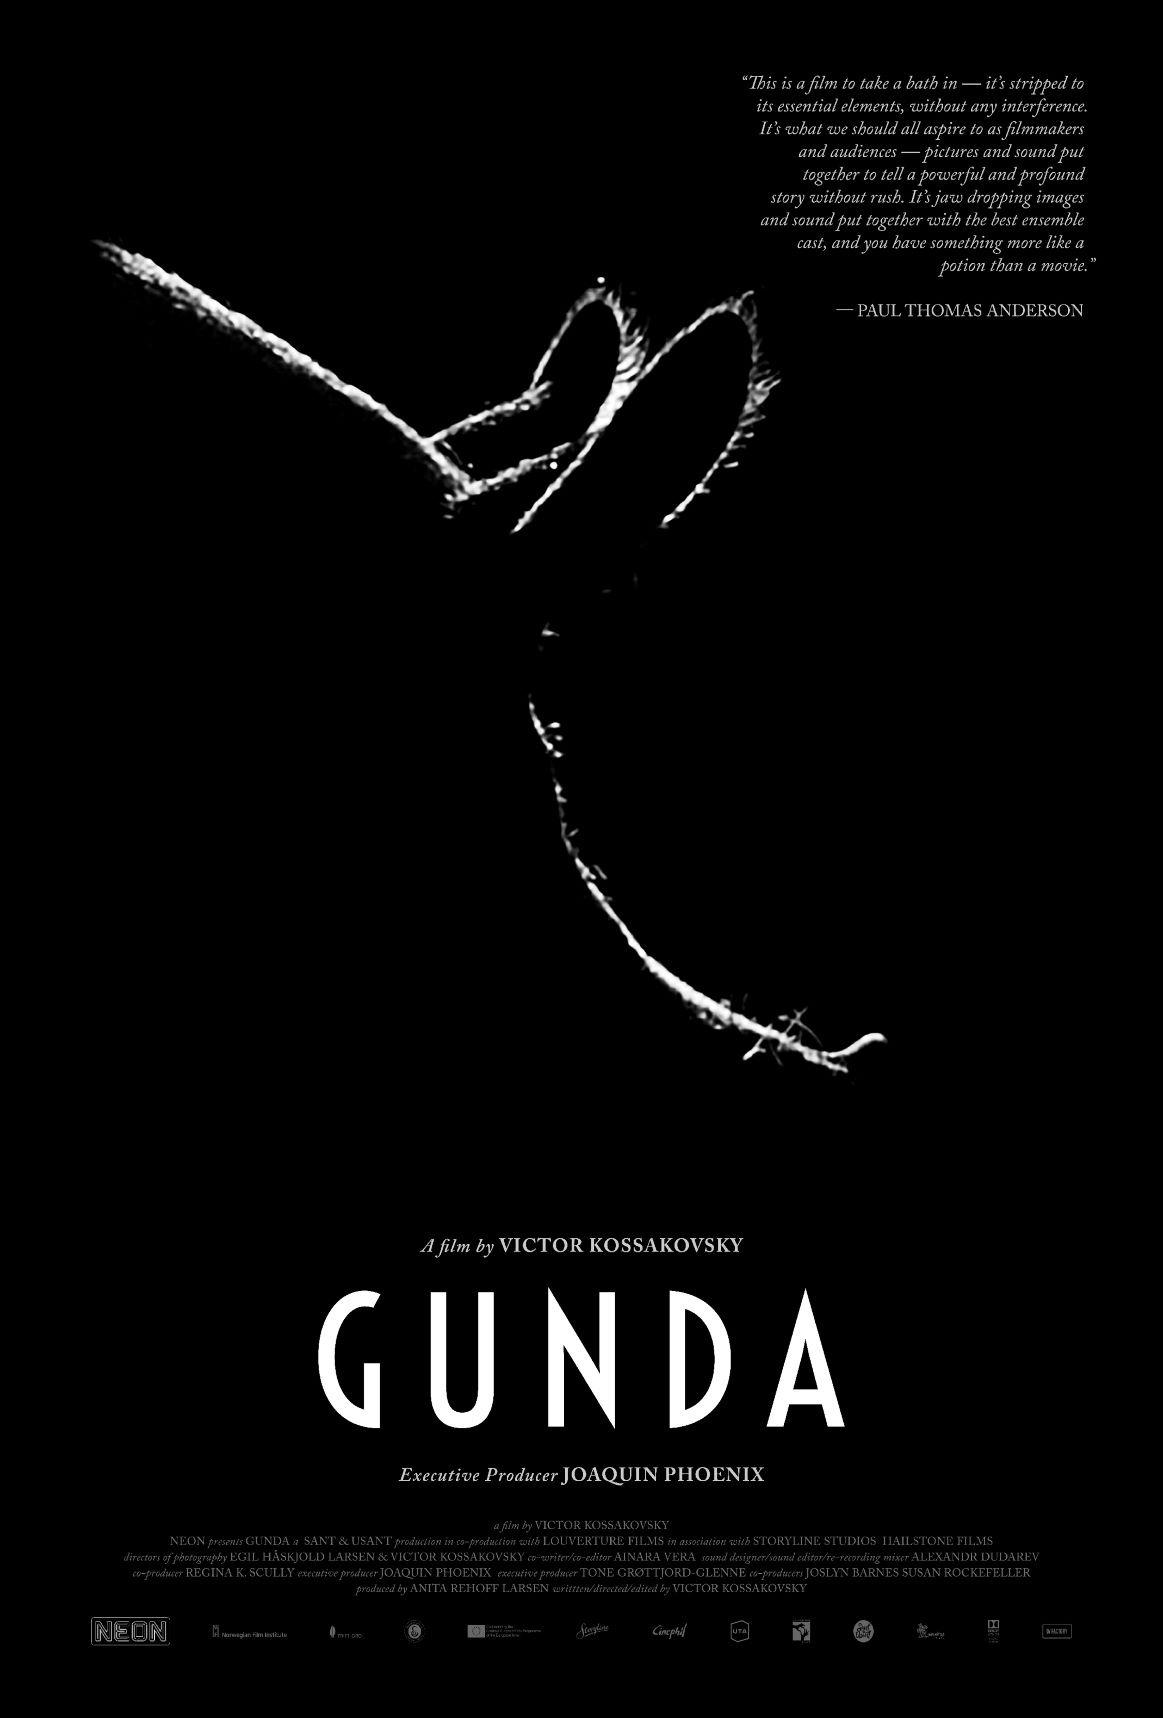 GUNDA Screening with Little Buckets Farm Sanctuary